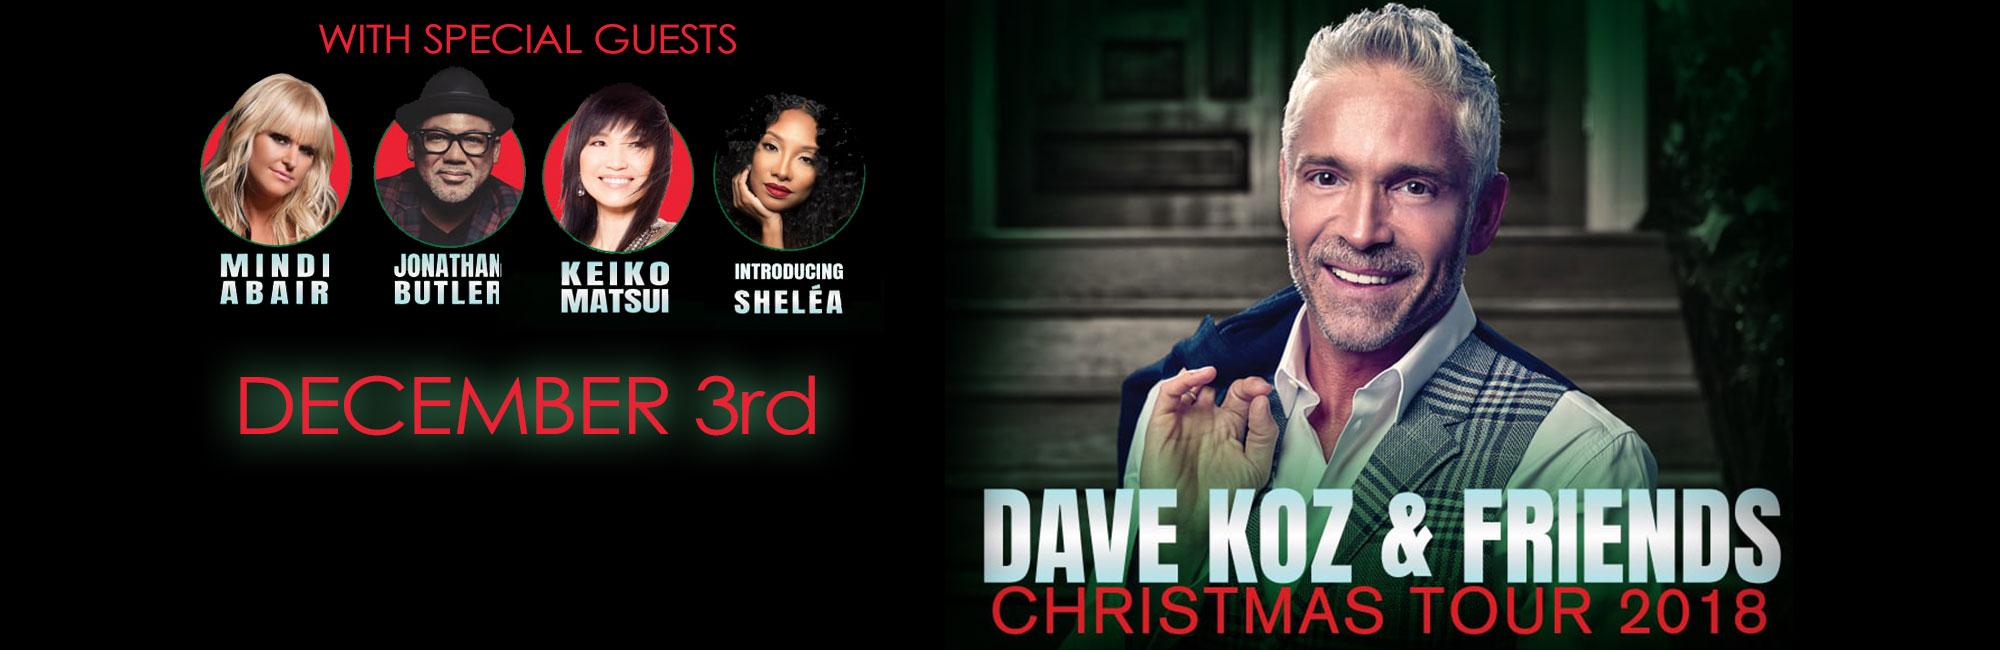 Dave Koz & Friends Christmas Tour 2018